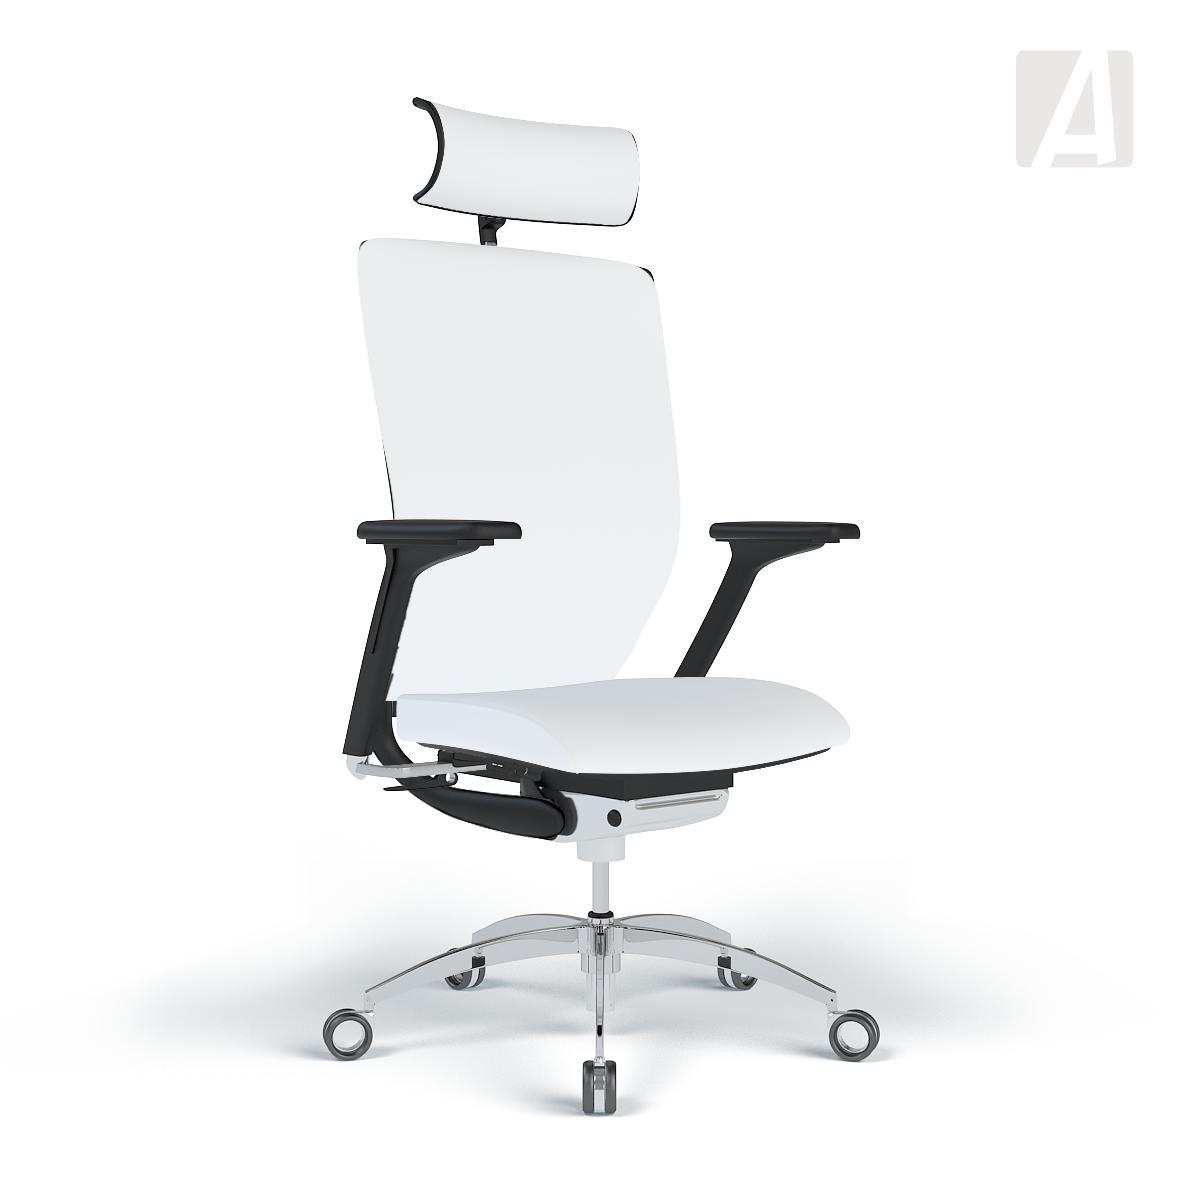 Bürostuhl weiß stoff  WAGNER Bürostuhl Titan 20 - Stoff Weiß - Gestell Schwarz | Apendics.de